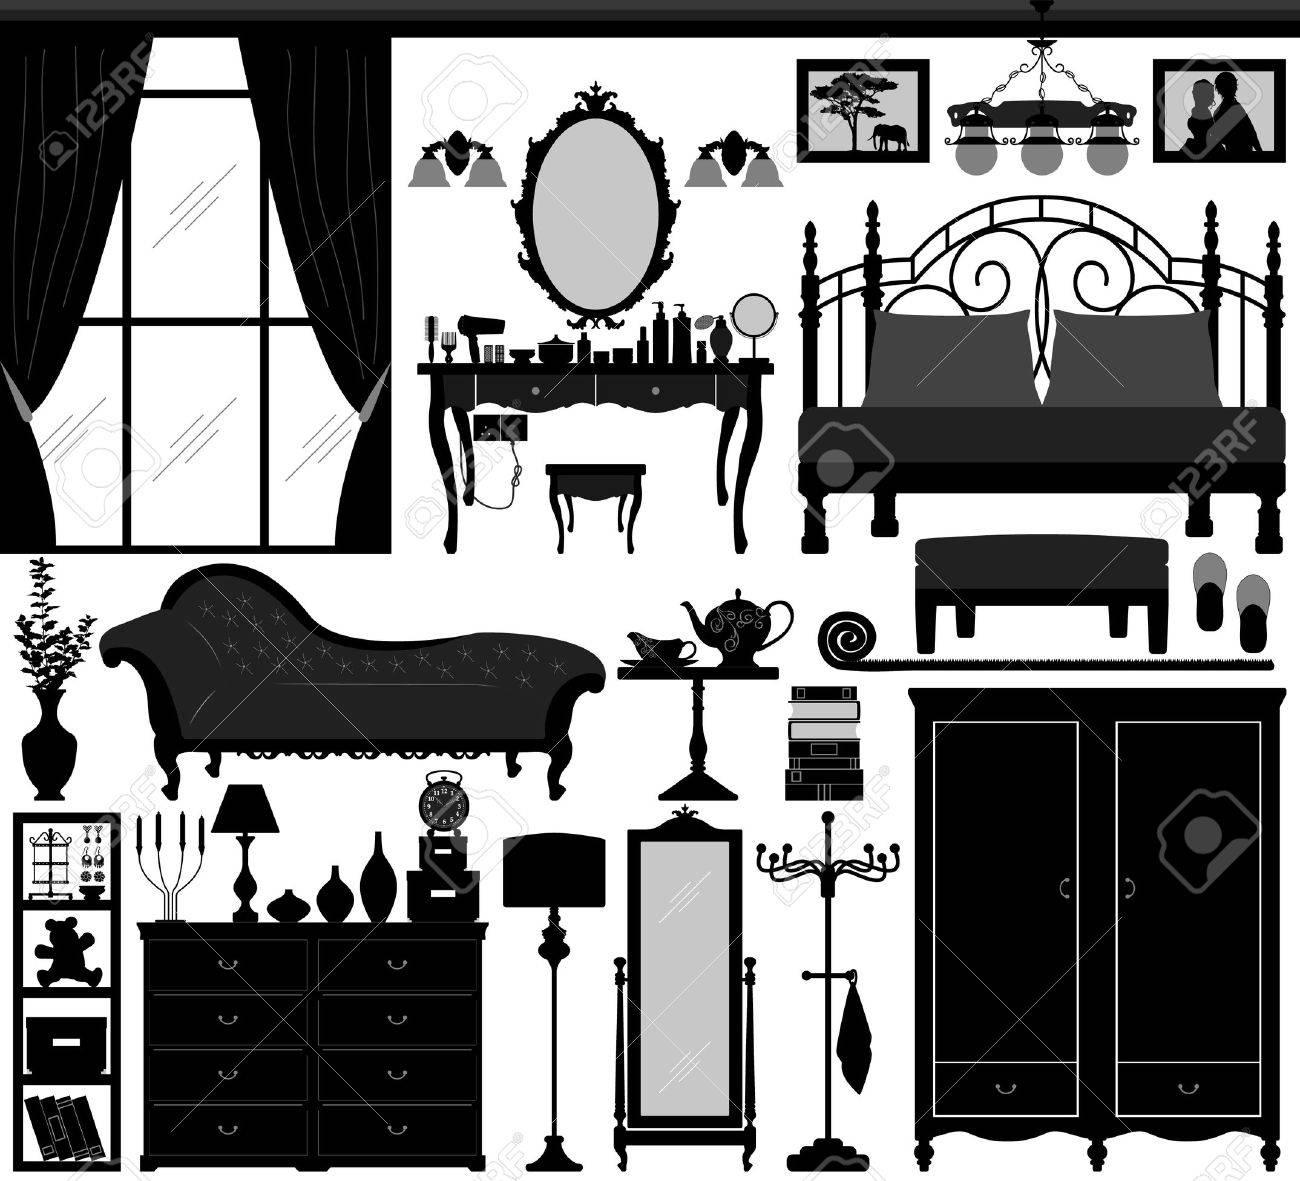 bedroom home interior design set black stock vector 8513568 - Basic Elements Of Interior Design